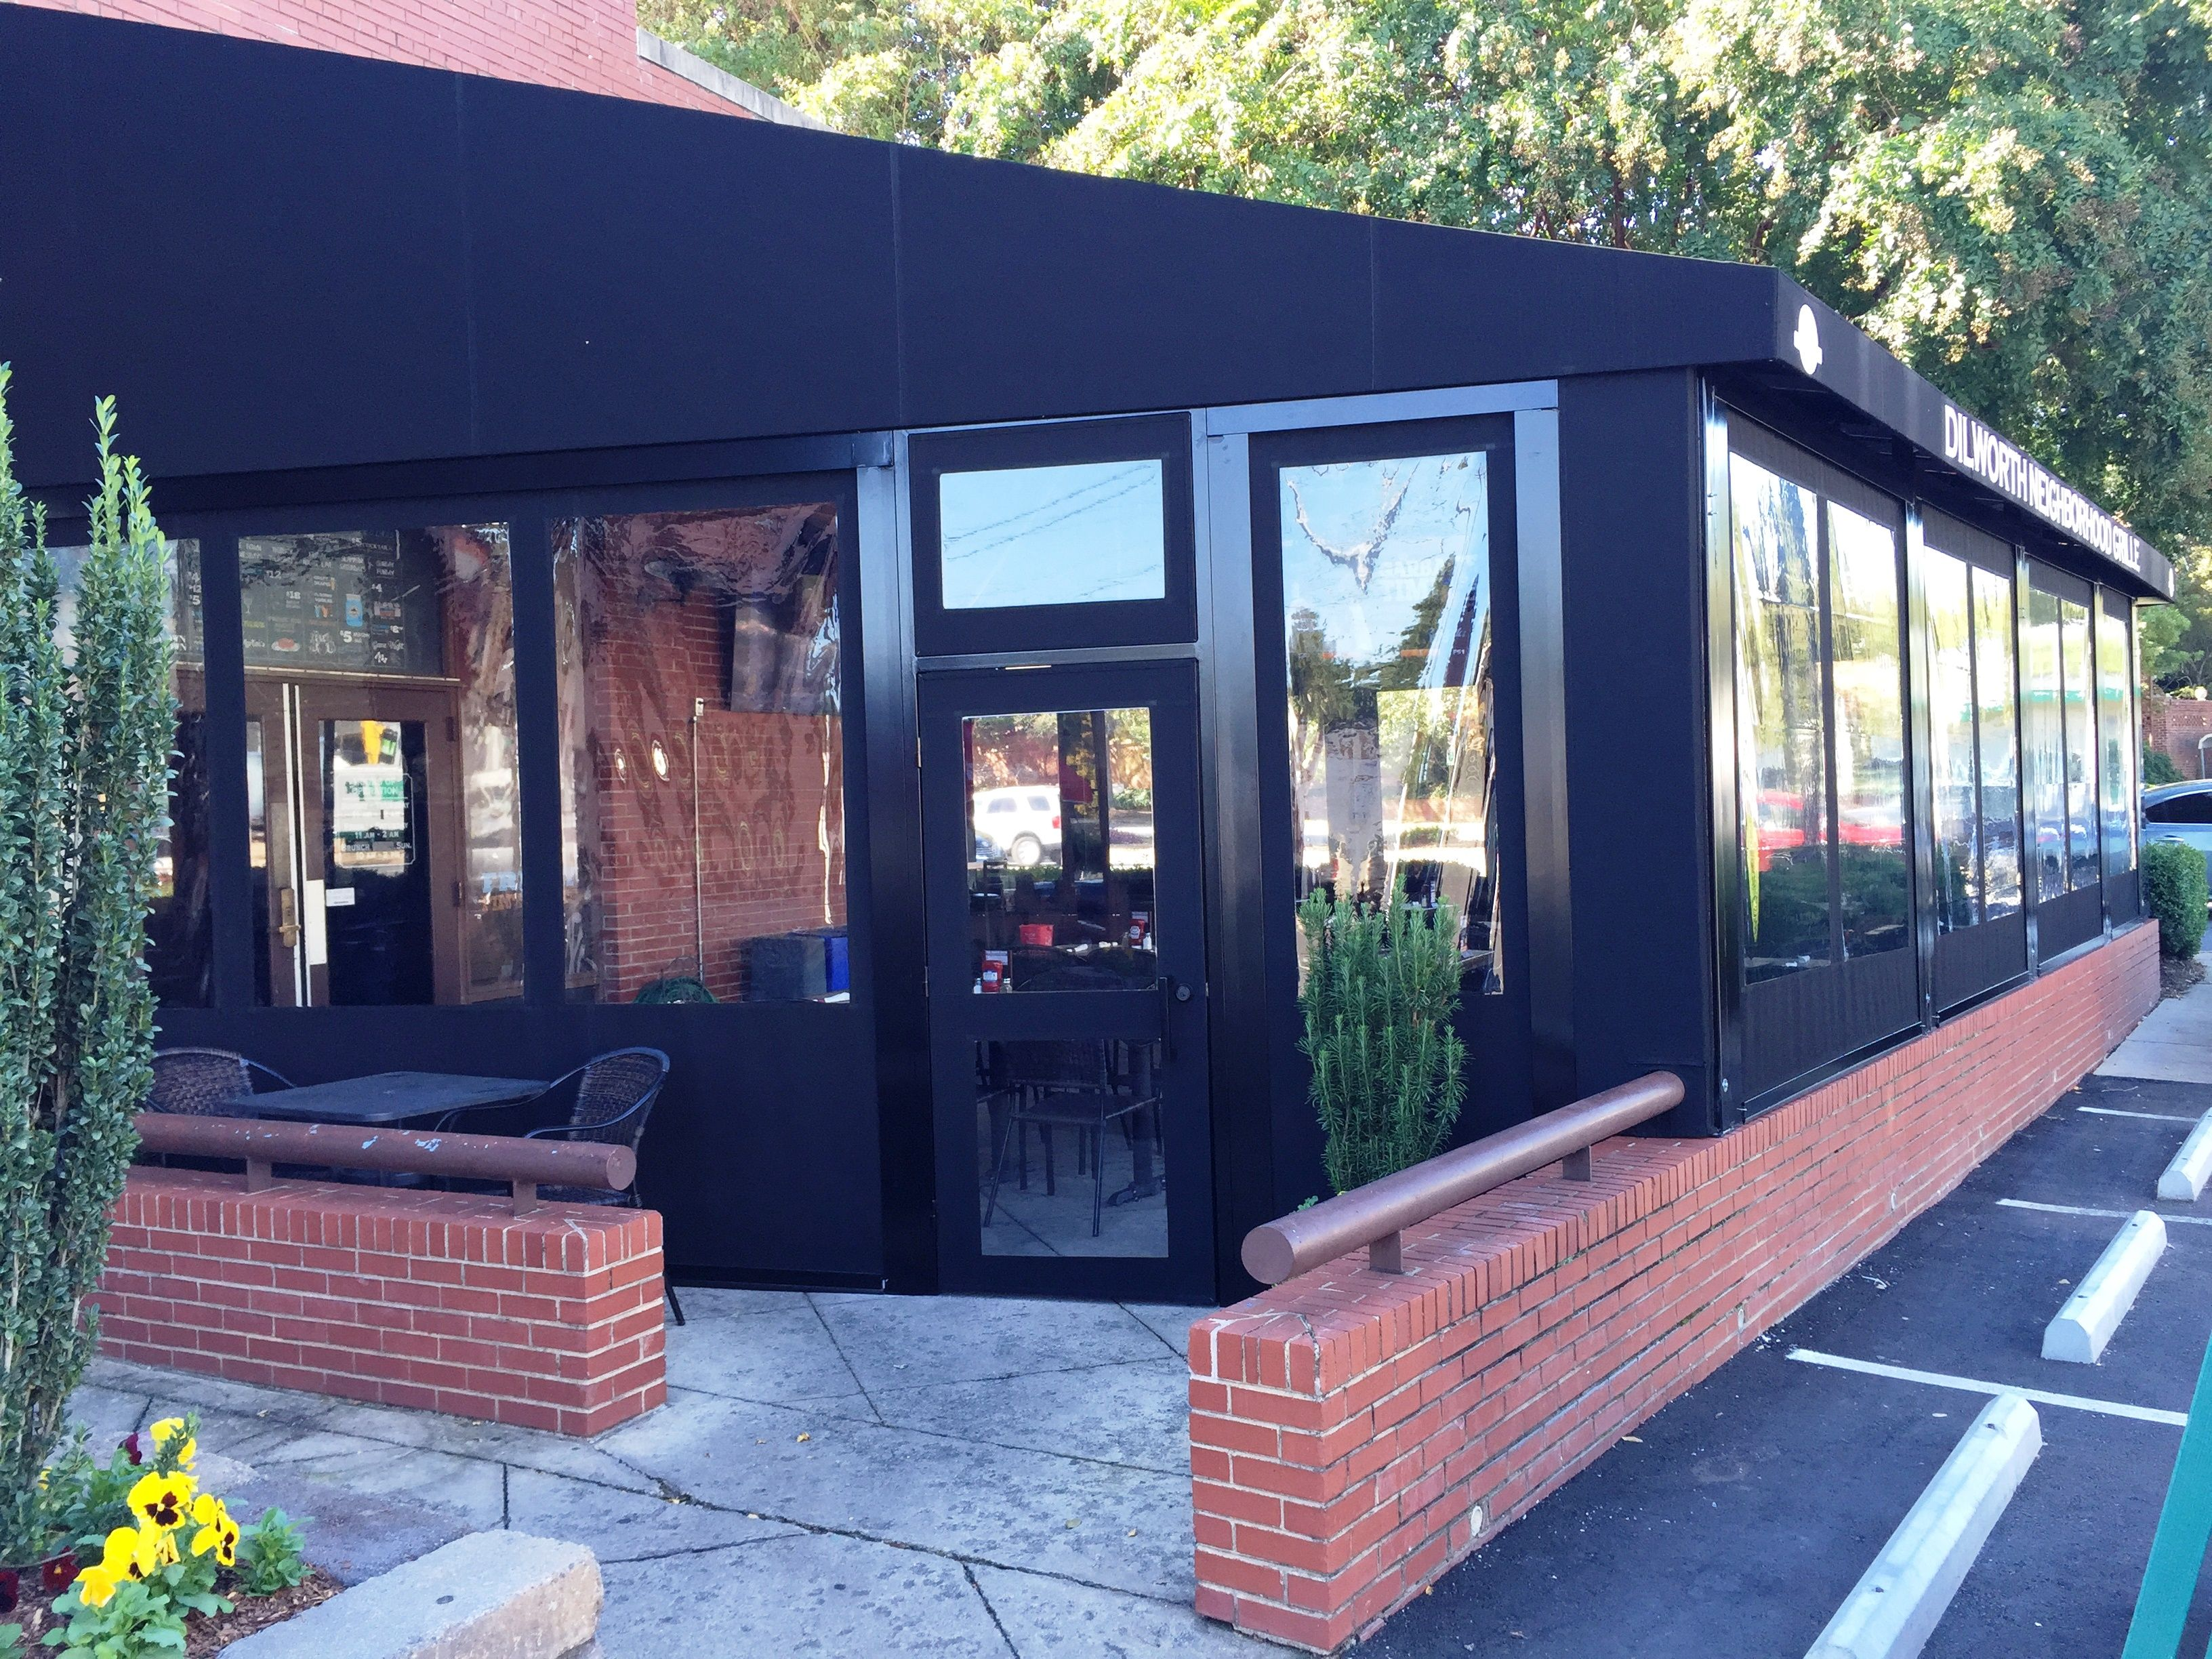 Dilworth Neighborhood Grill Patio Enclosure Charlotte, NC